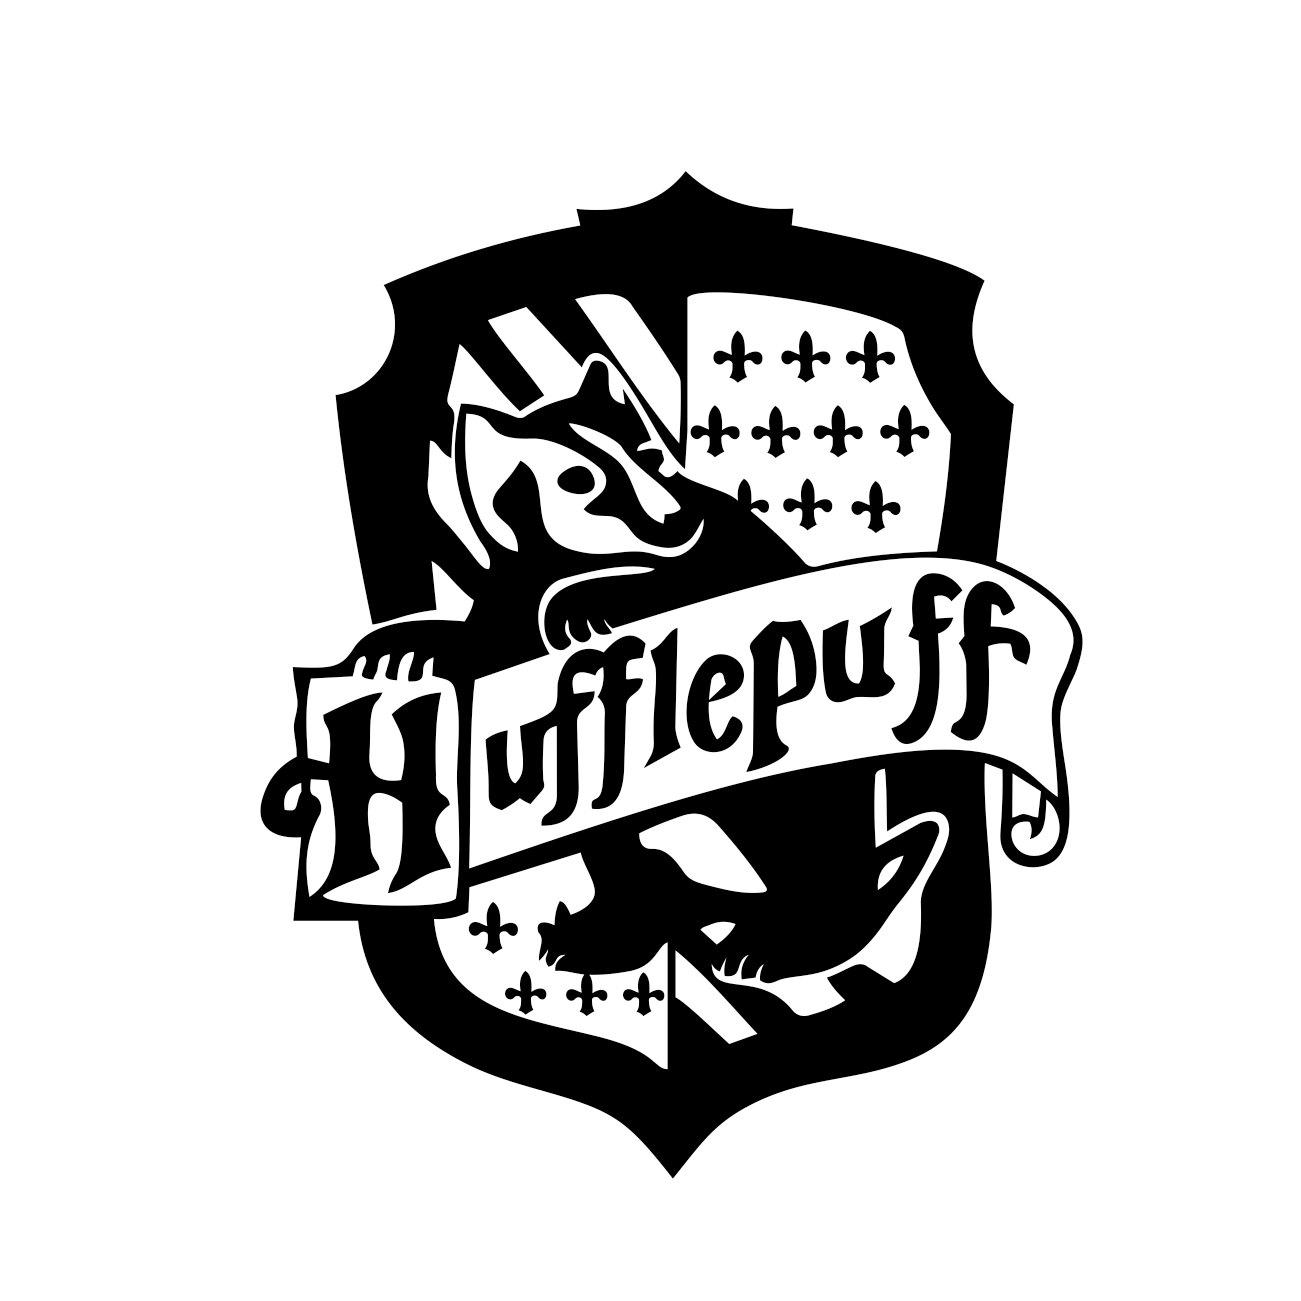 Hufflepuff crest clipart picture transparent download Hufflepuff Harry Potter House Badge Crest graphics design SVG DXF EPS Png  Cdr Ai Pdf Vector Art Clipart instant Digital Cut Print File Decal picture transparent download